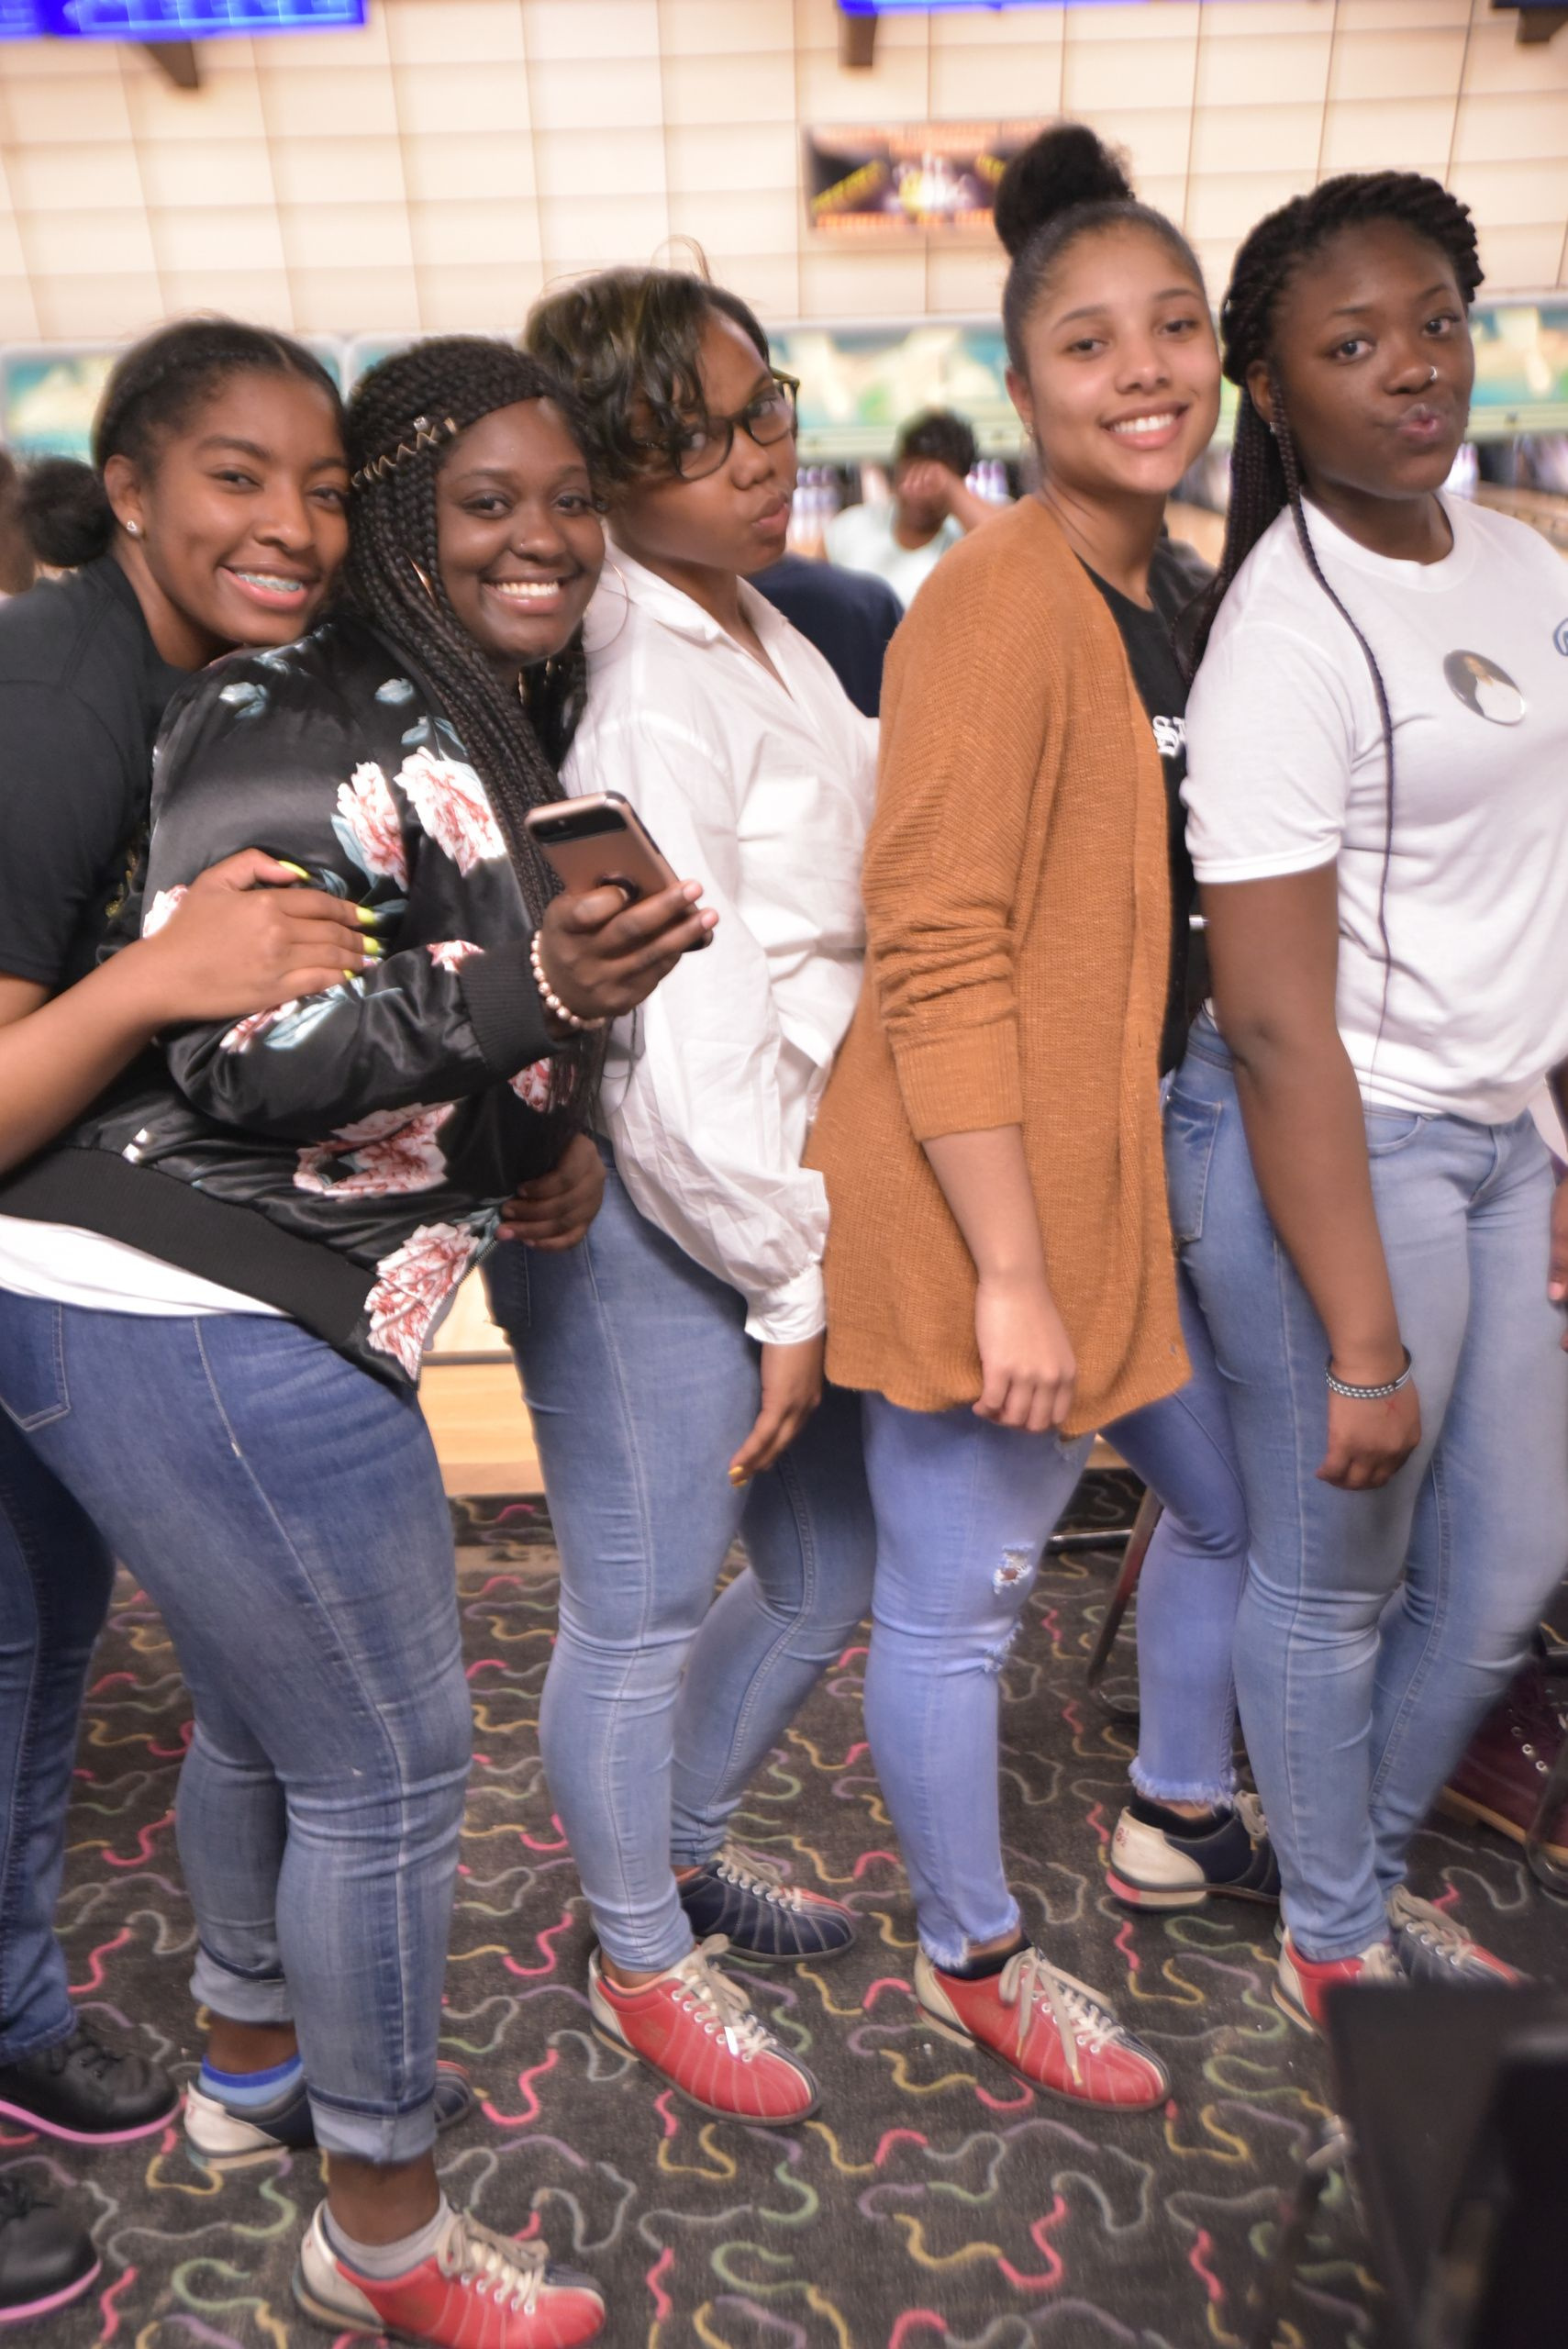 Female Group